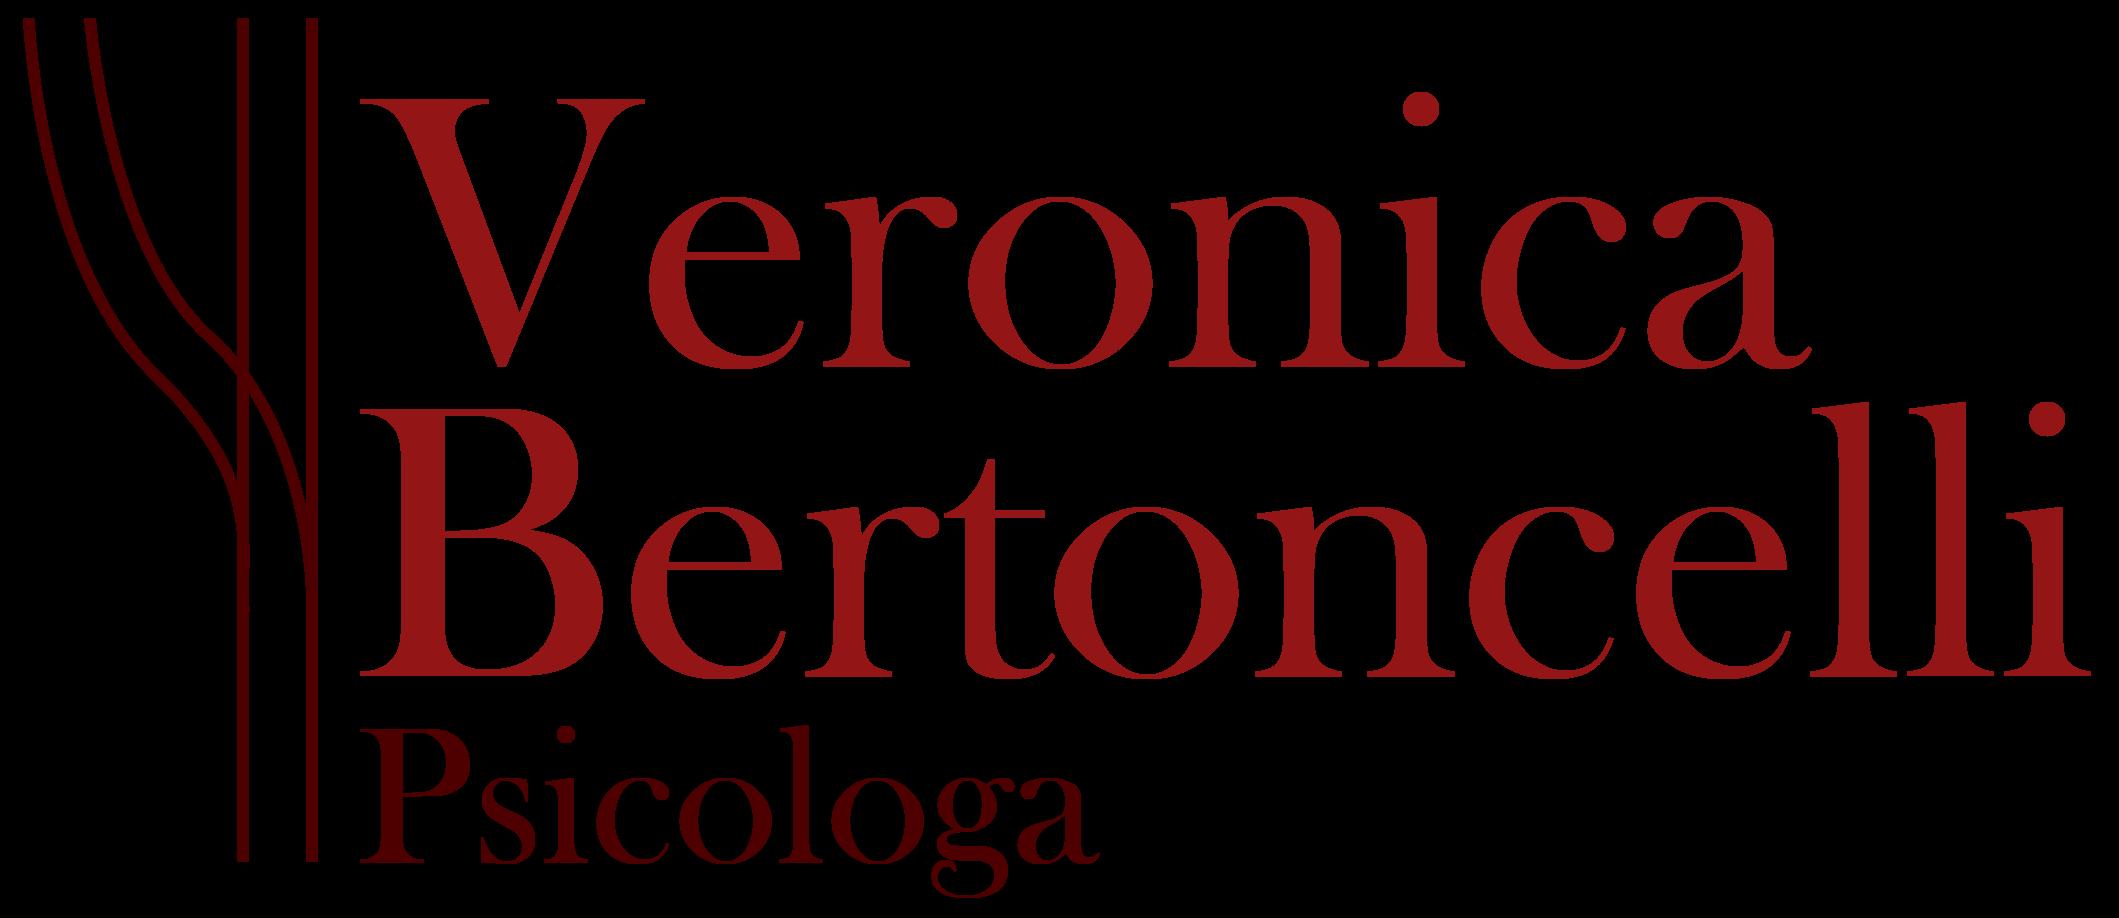 Veronica Bertoncelli